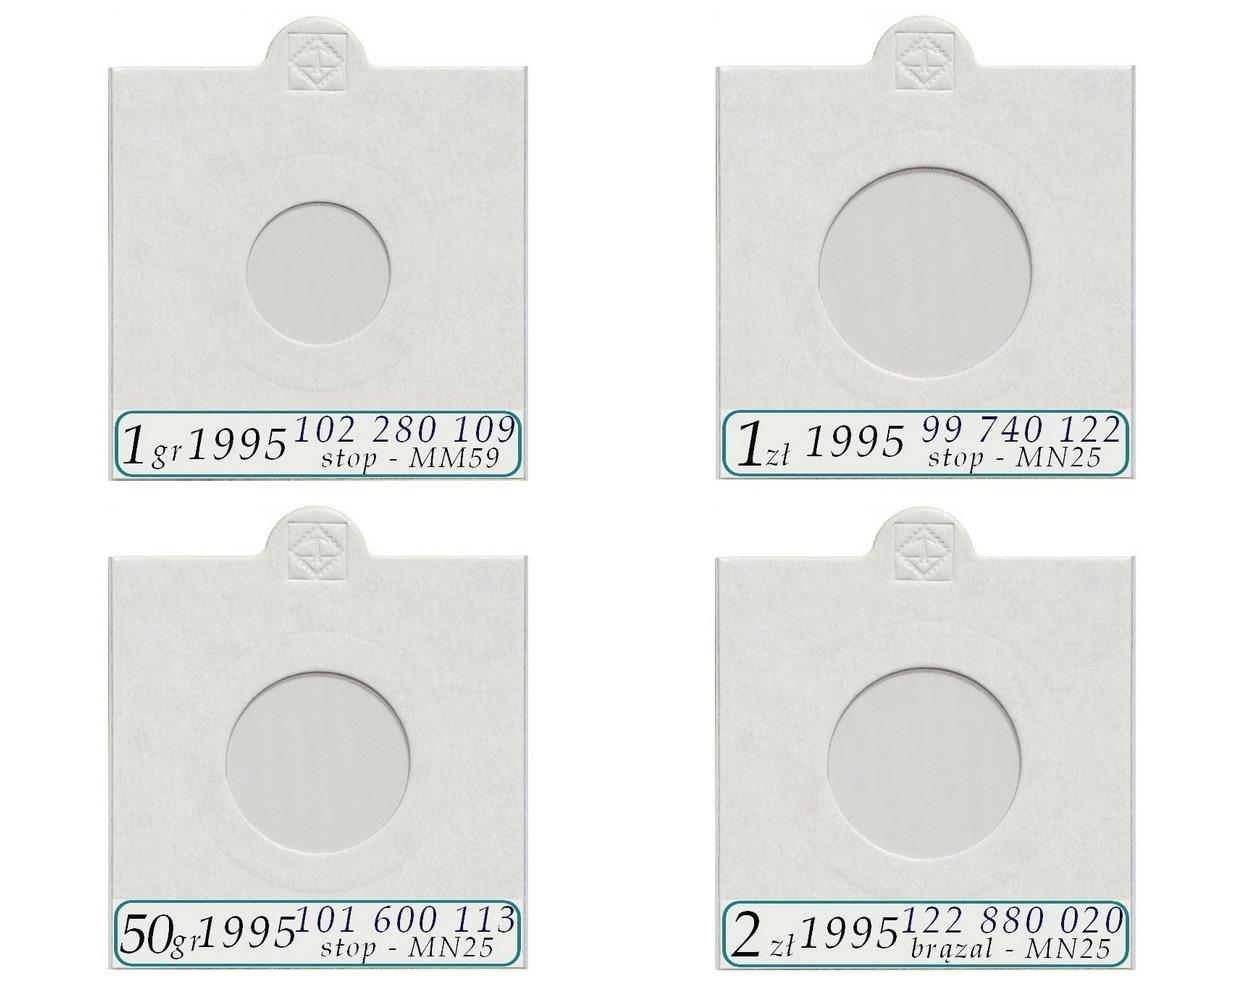 Komplet 4 holderów na monety obiegowe 1995 + opisy